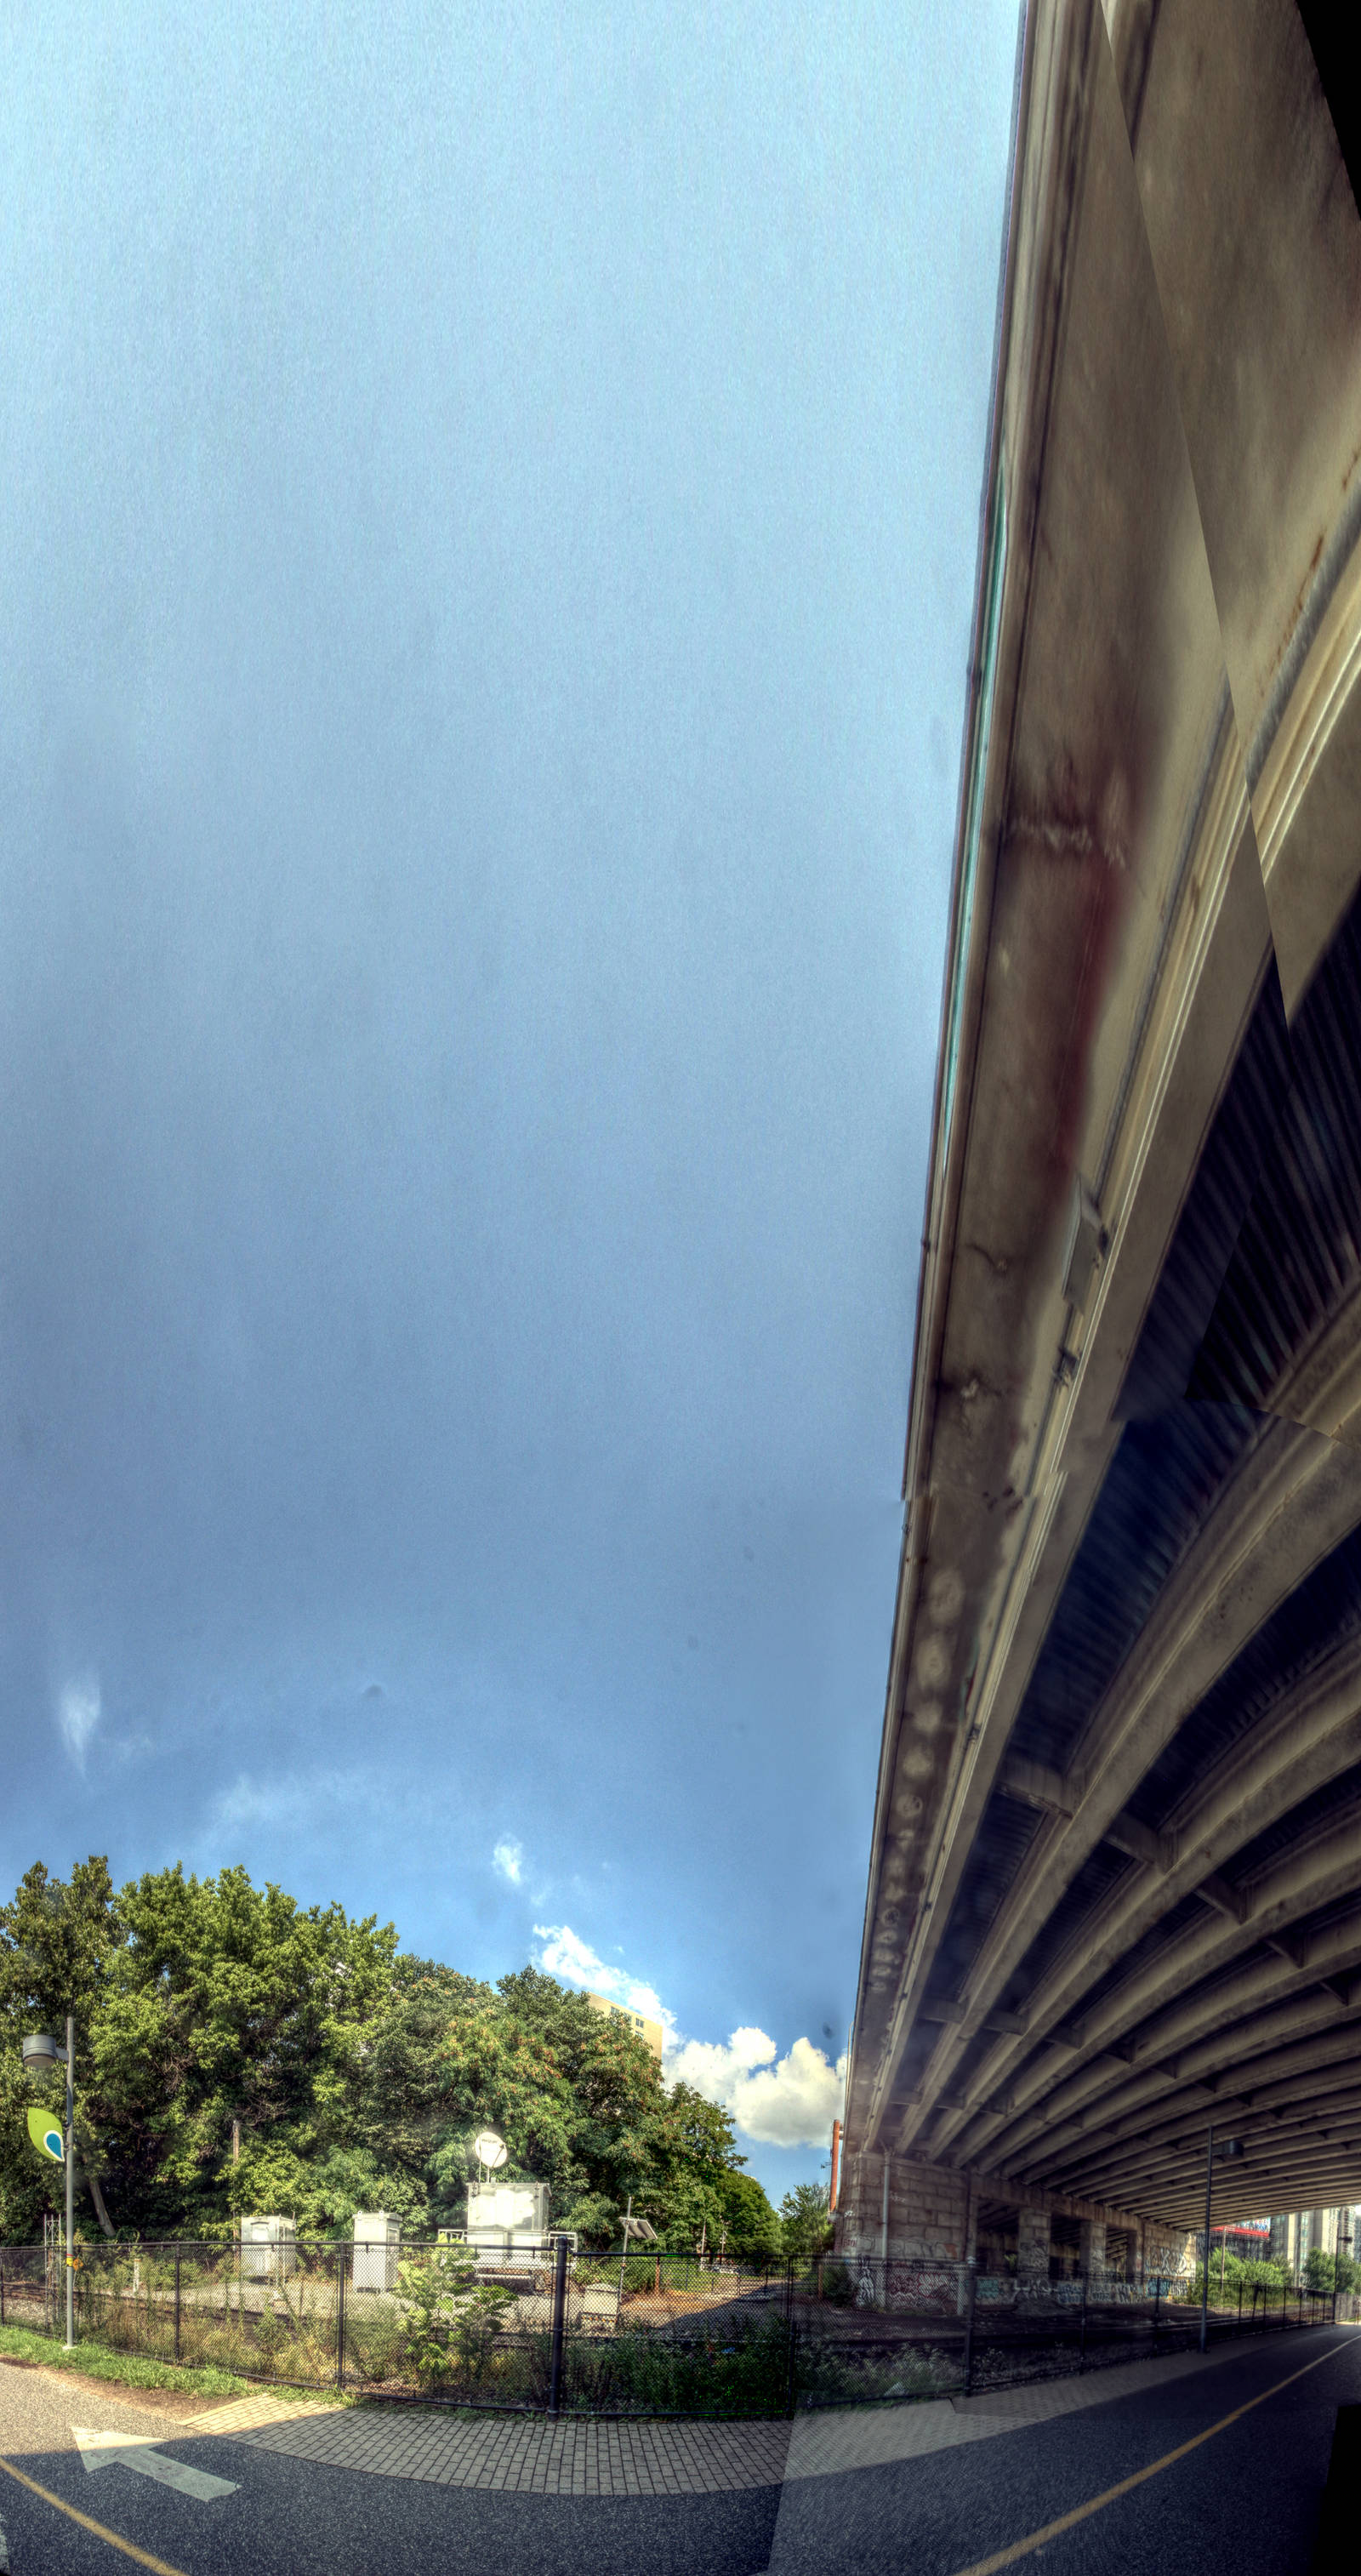 Panorama 3782 hdr pregamma 1 mantiuk06 contrast ma by bruhinb